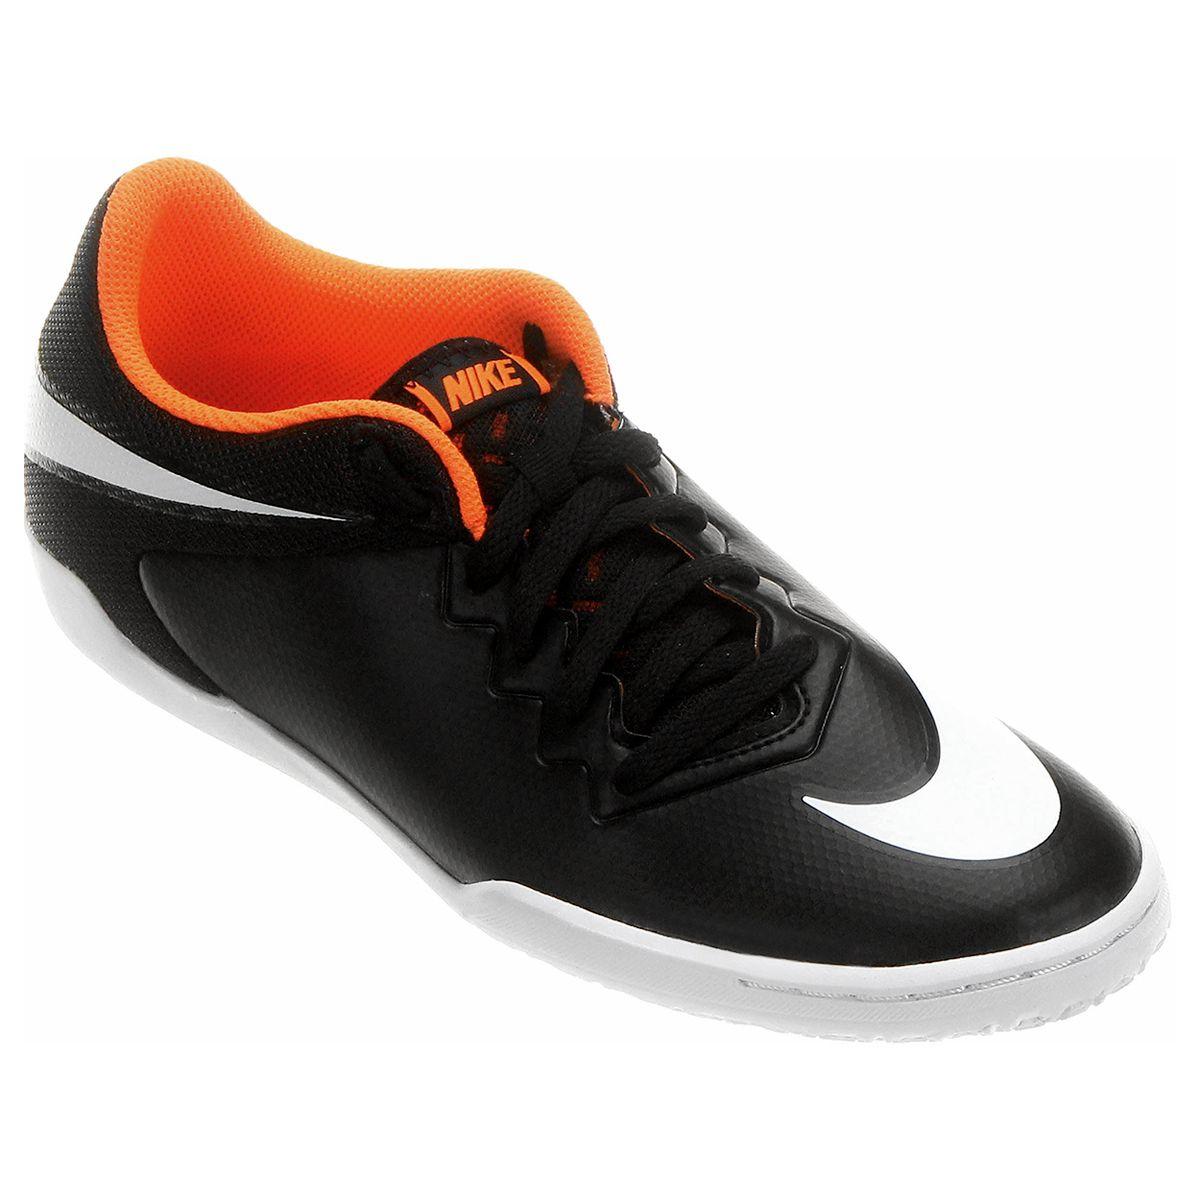 finest selection 5a1f3 1df05 ... buy chuteira nike hypervenom pro street ic futsal preto e branco  netshoes 644f4 58f94